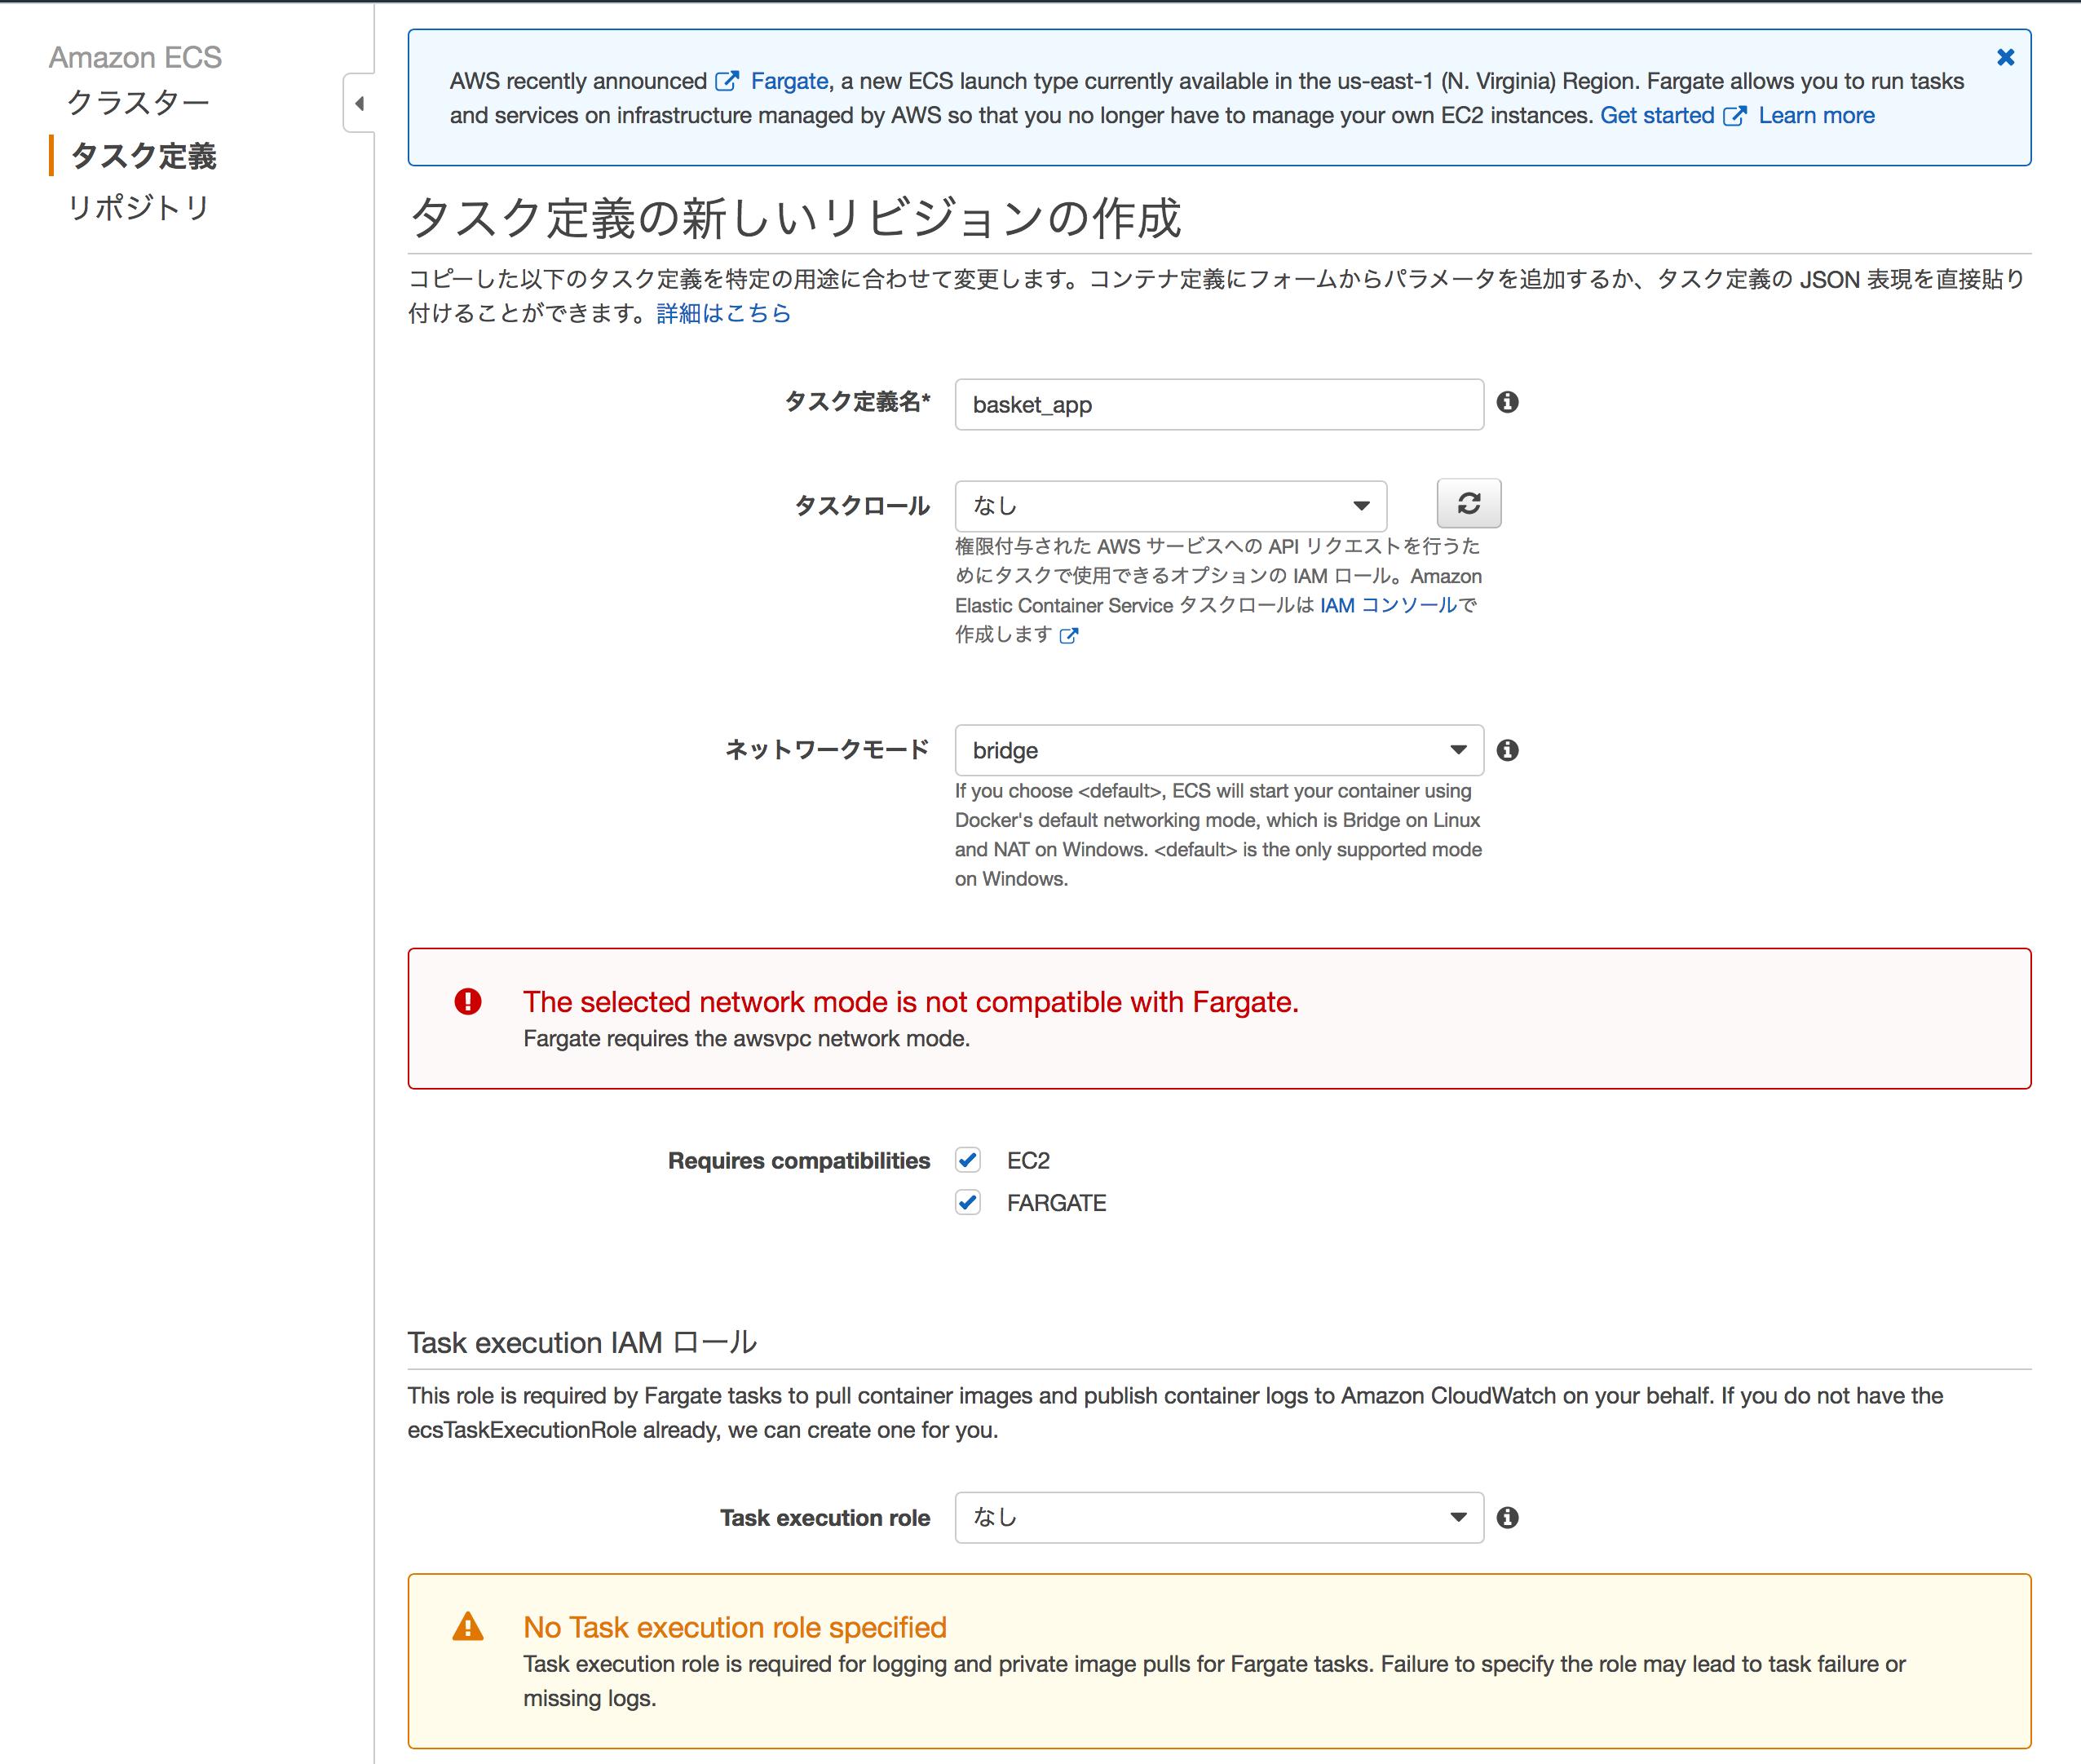 Screenshot-2017-12-4 Amazon ECS(2).png